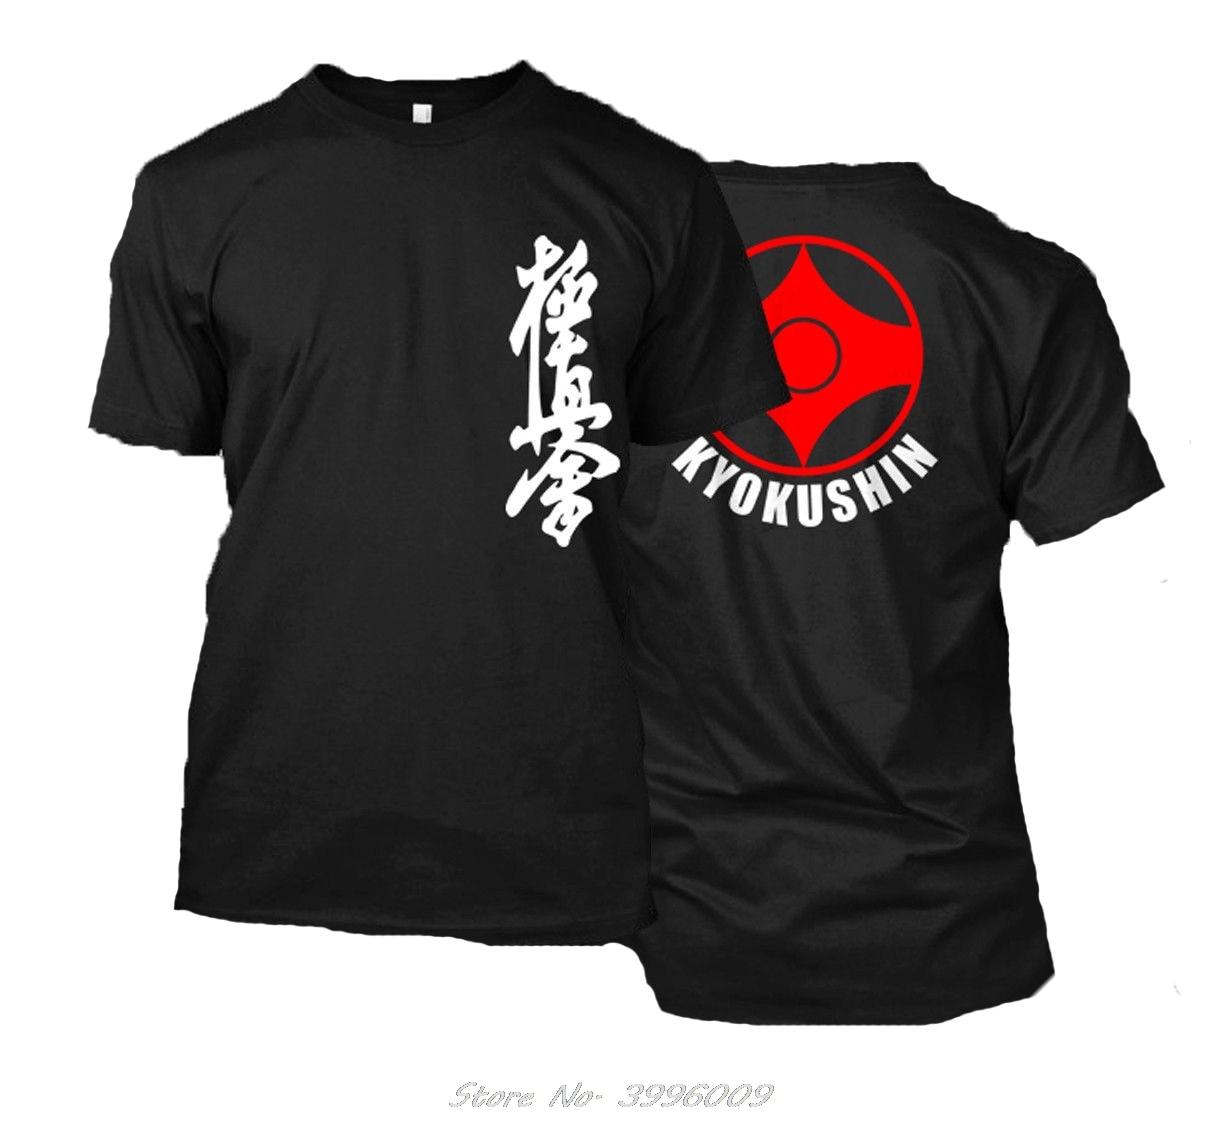 Loose Black  Tshirts Homme Tees Kyokushin Karate Masutatsu Oyama Karate Japan - Custom T-Shirt Tee Print T-Shirt Mens